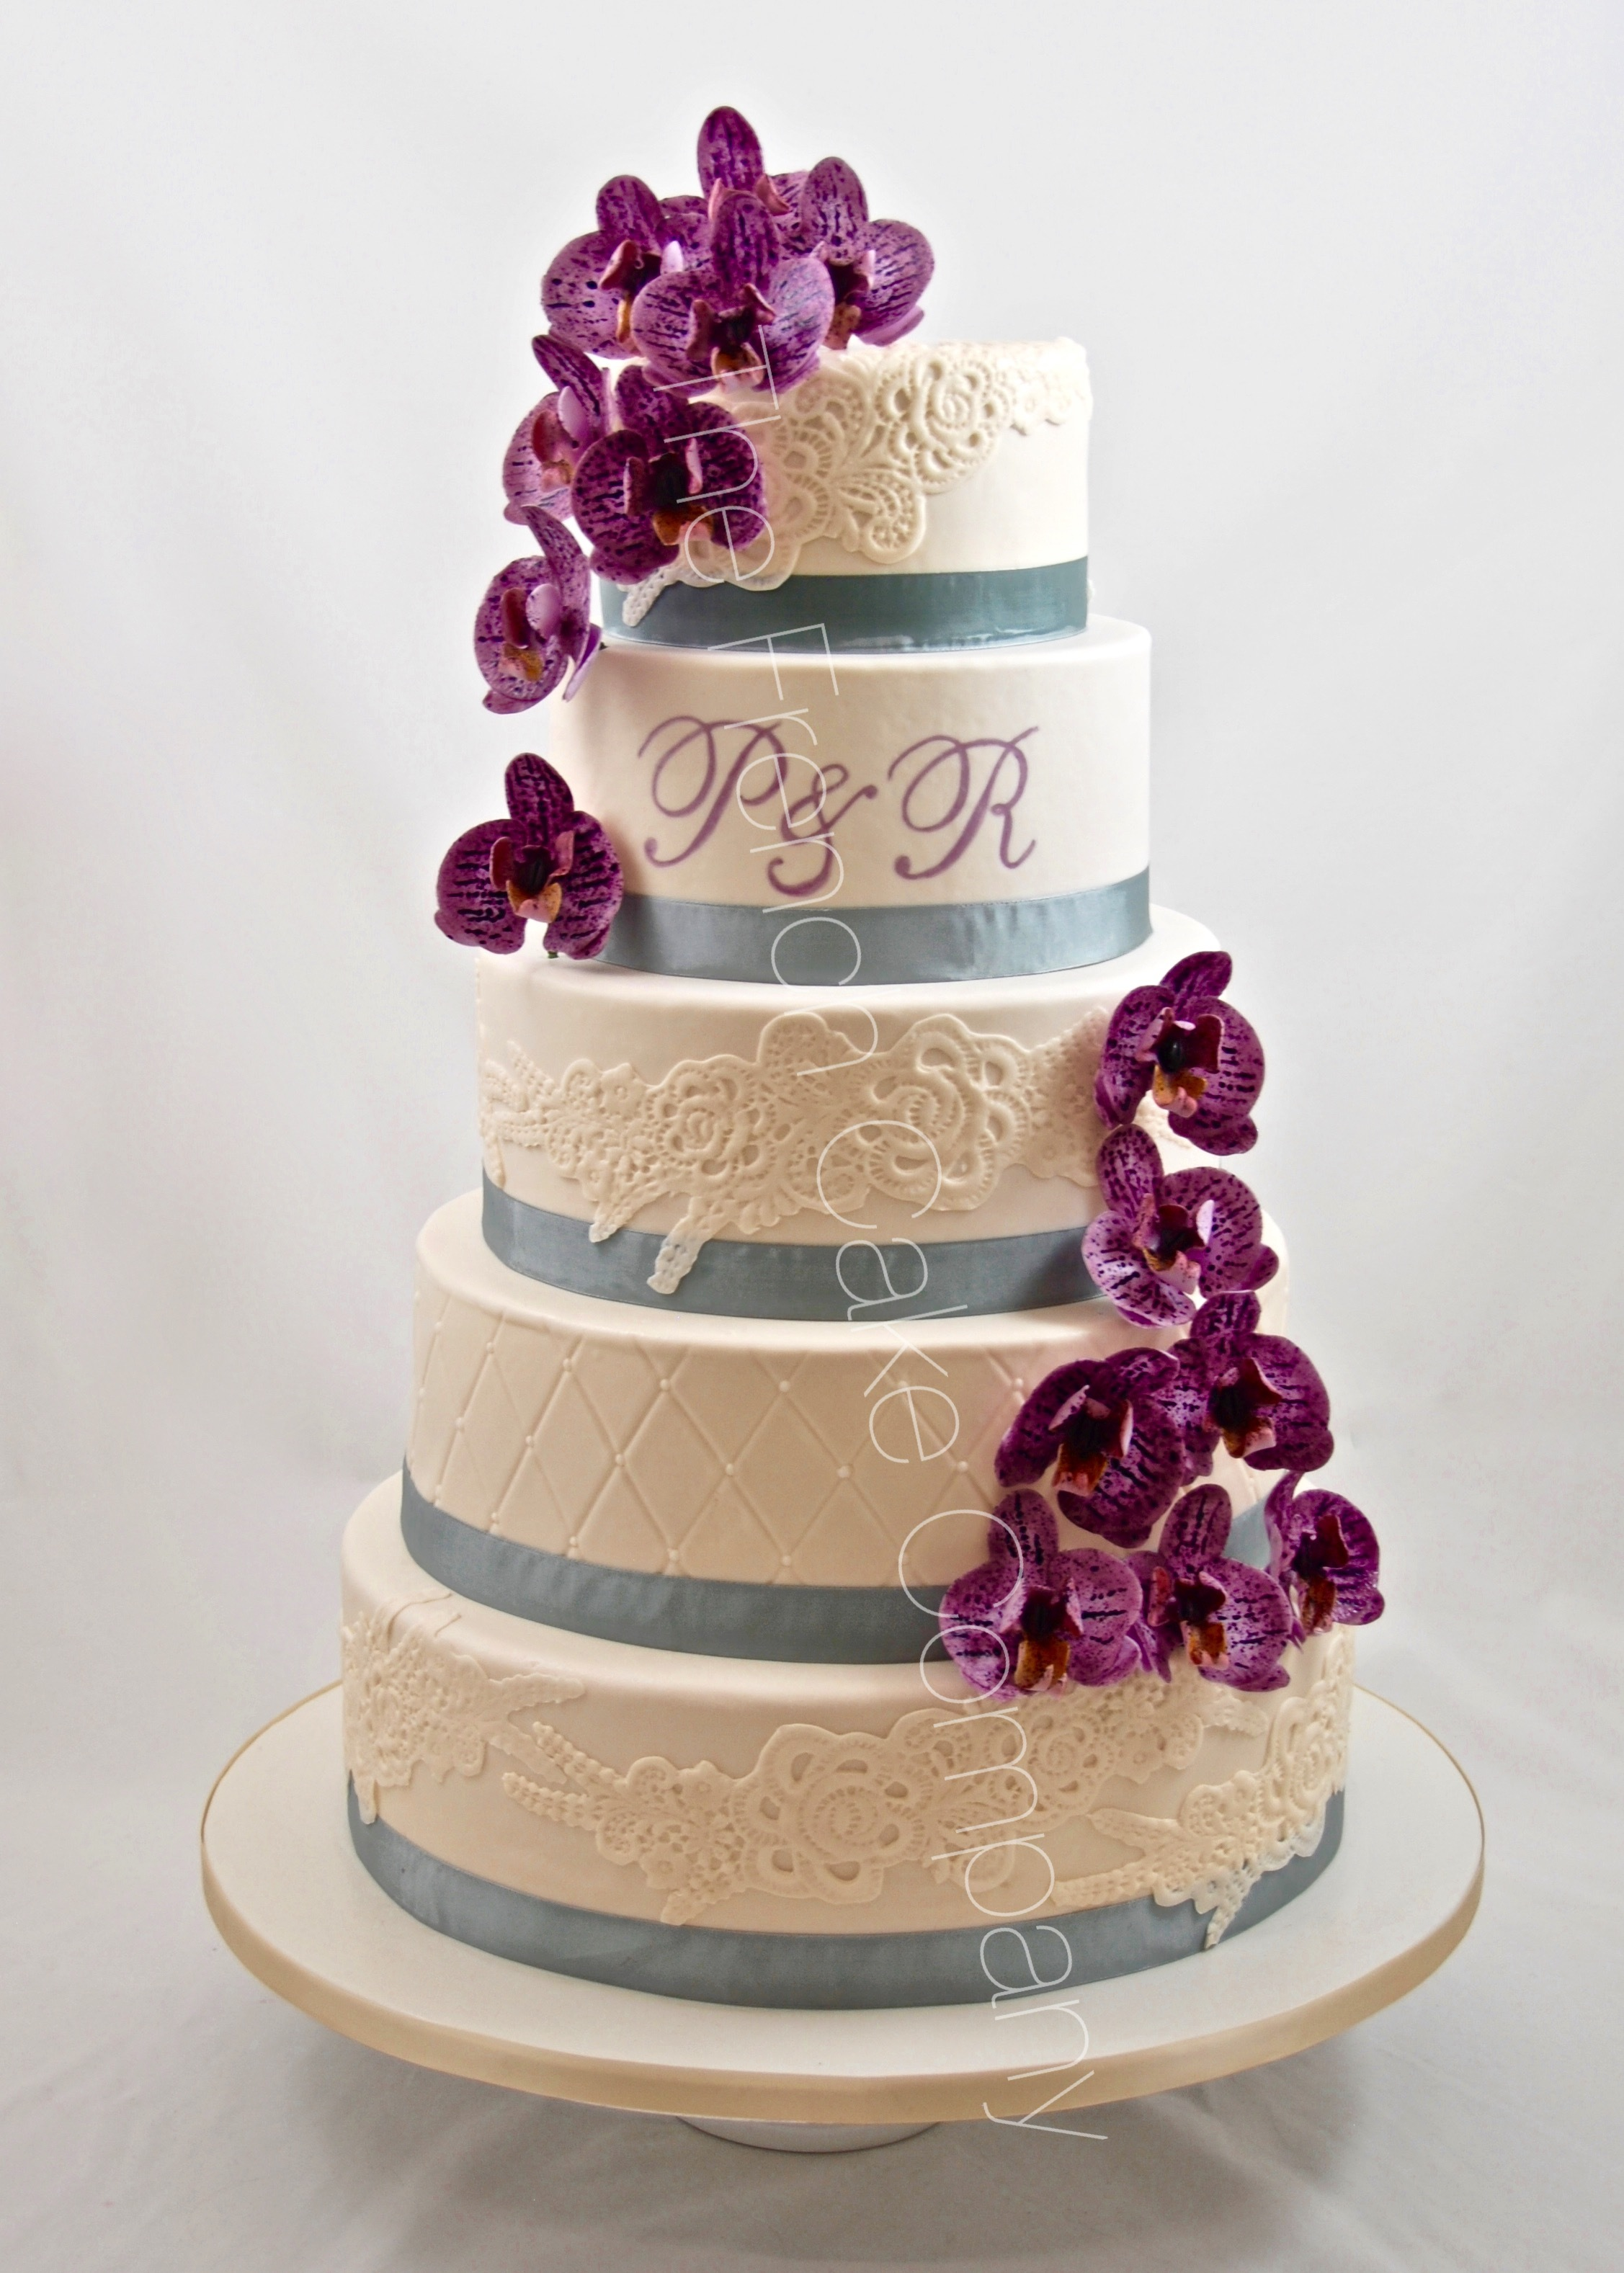 White wedding with purple sugar flowers